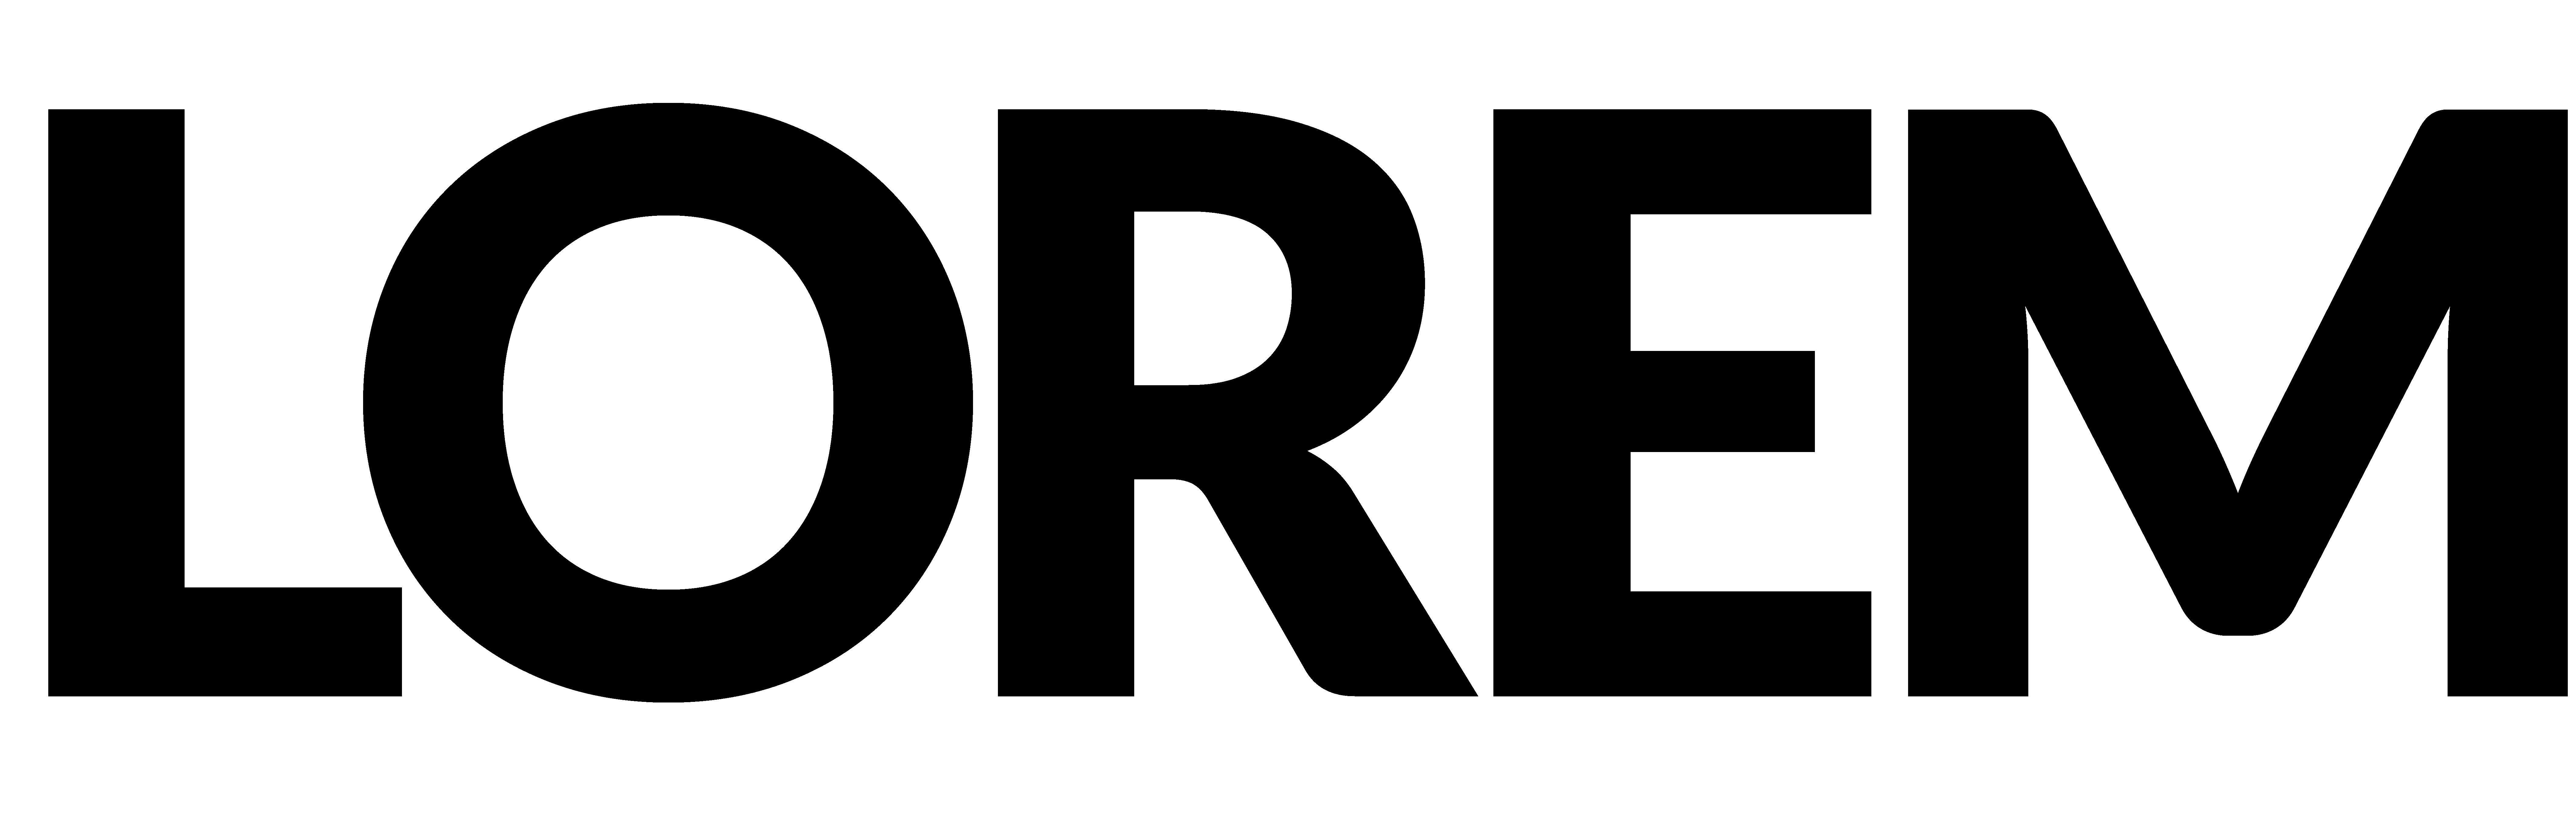 logotyp123